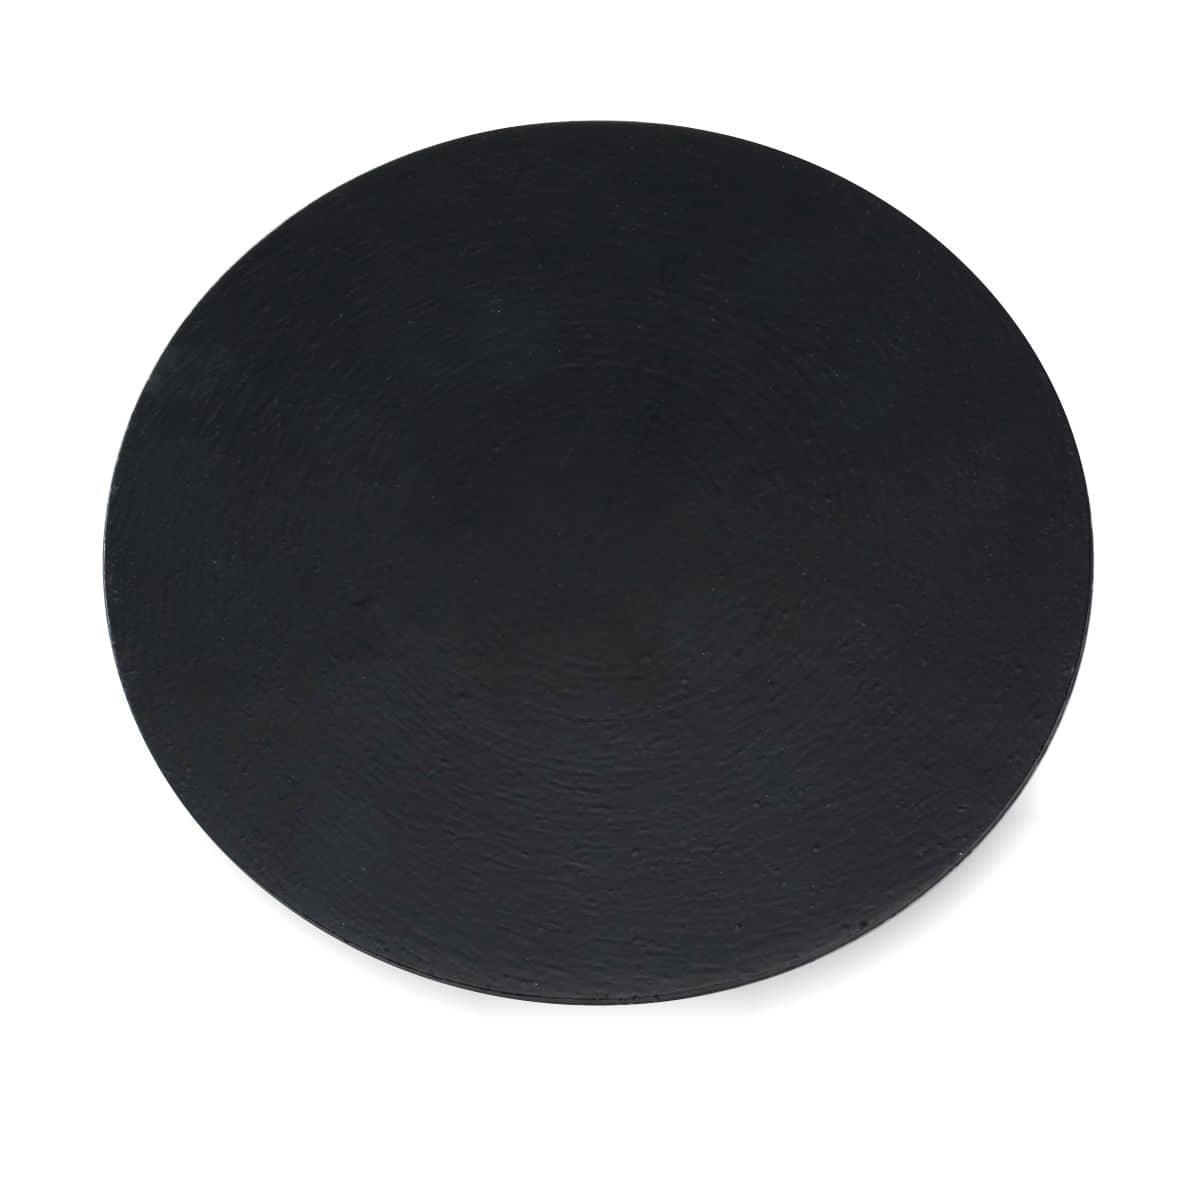 Kerzenteller Alu 140 mm, schwarz